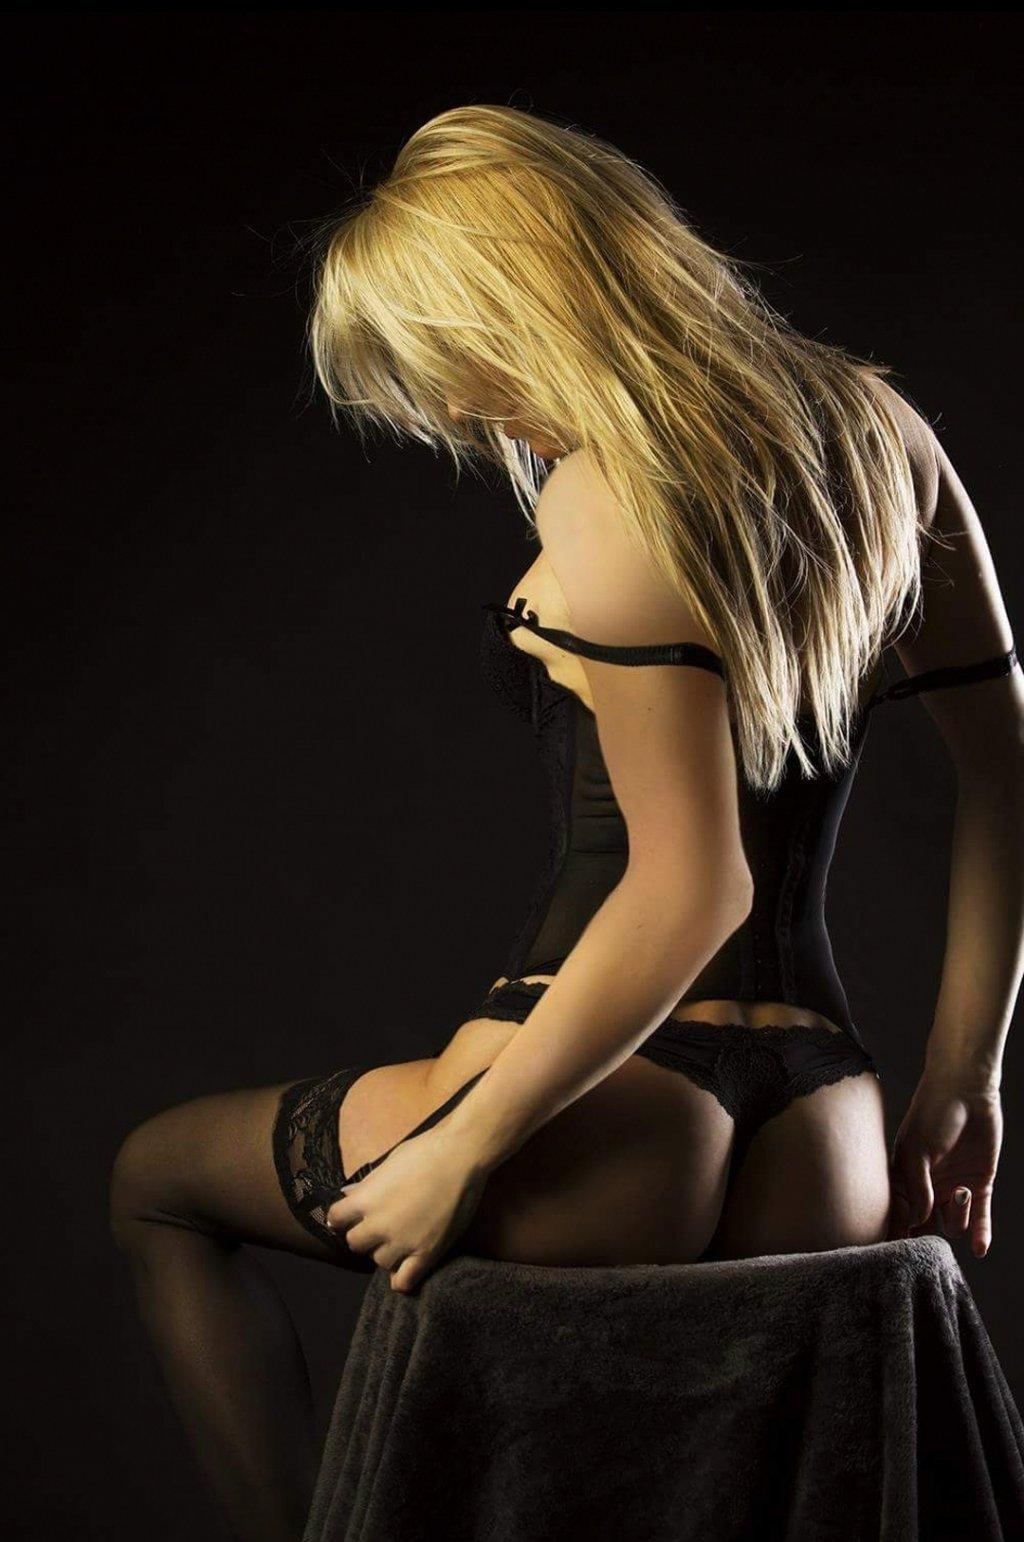 Jihoesk Kraj - inzerty 21 a 30 - Afrodita - erotick seznamka